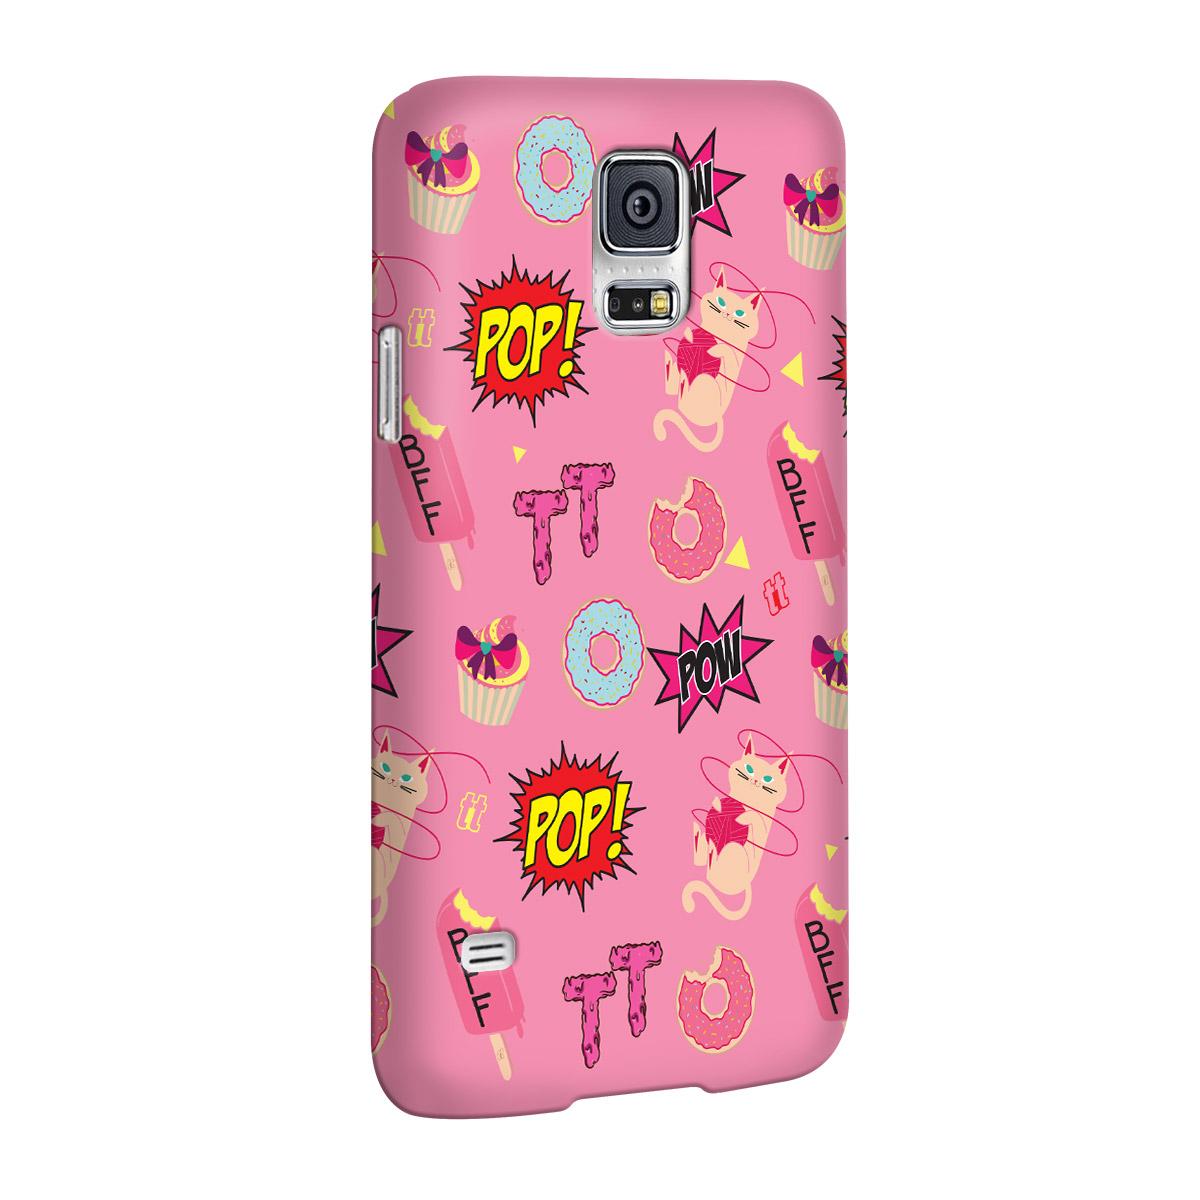 Capa para Galaxy S5 TodaTeen POP!